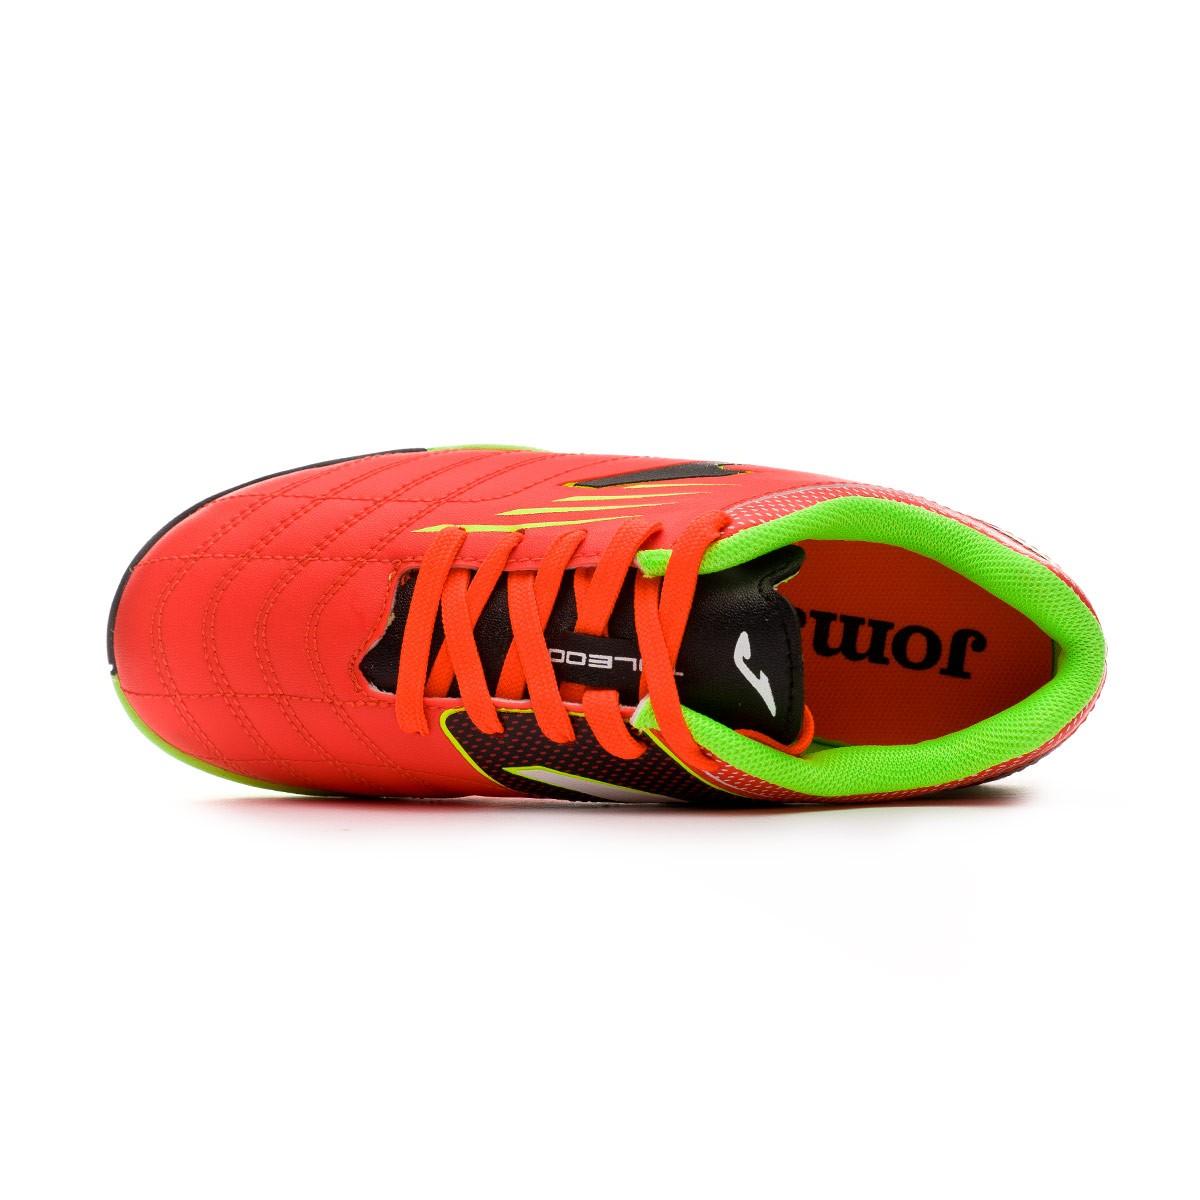 Football Boot Joma Kids Toledo Turf Orange-Lime - Leaked soccer 2677a86d4c0a6